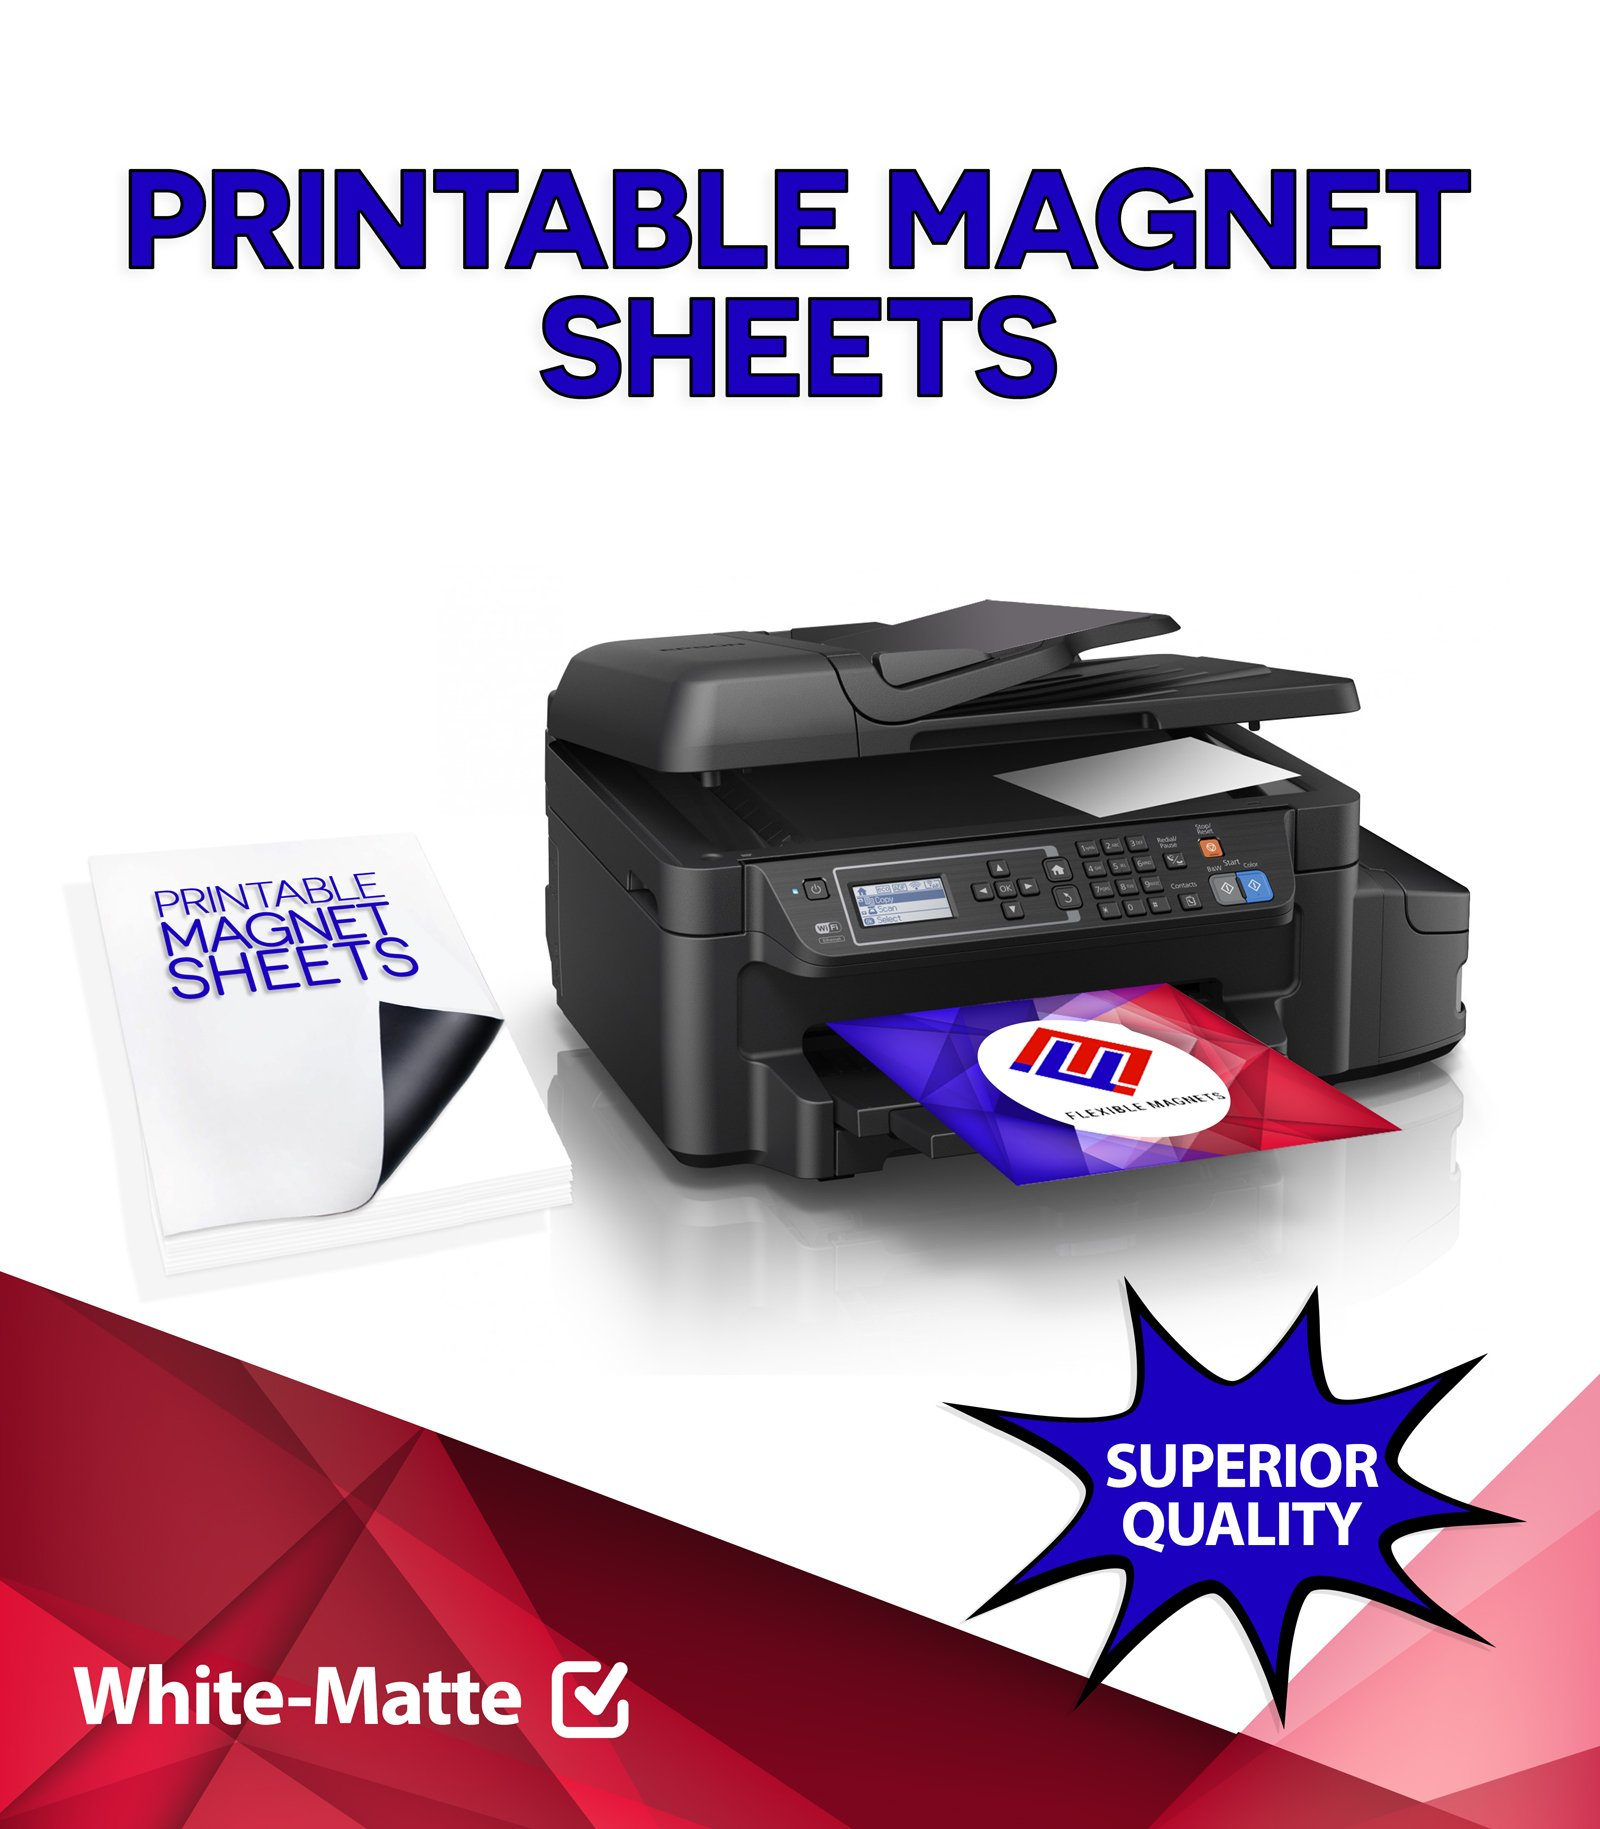 25 Sheets of Matte Inkjet Printable Magnetic Paper 8.5'' x 5.5''